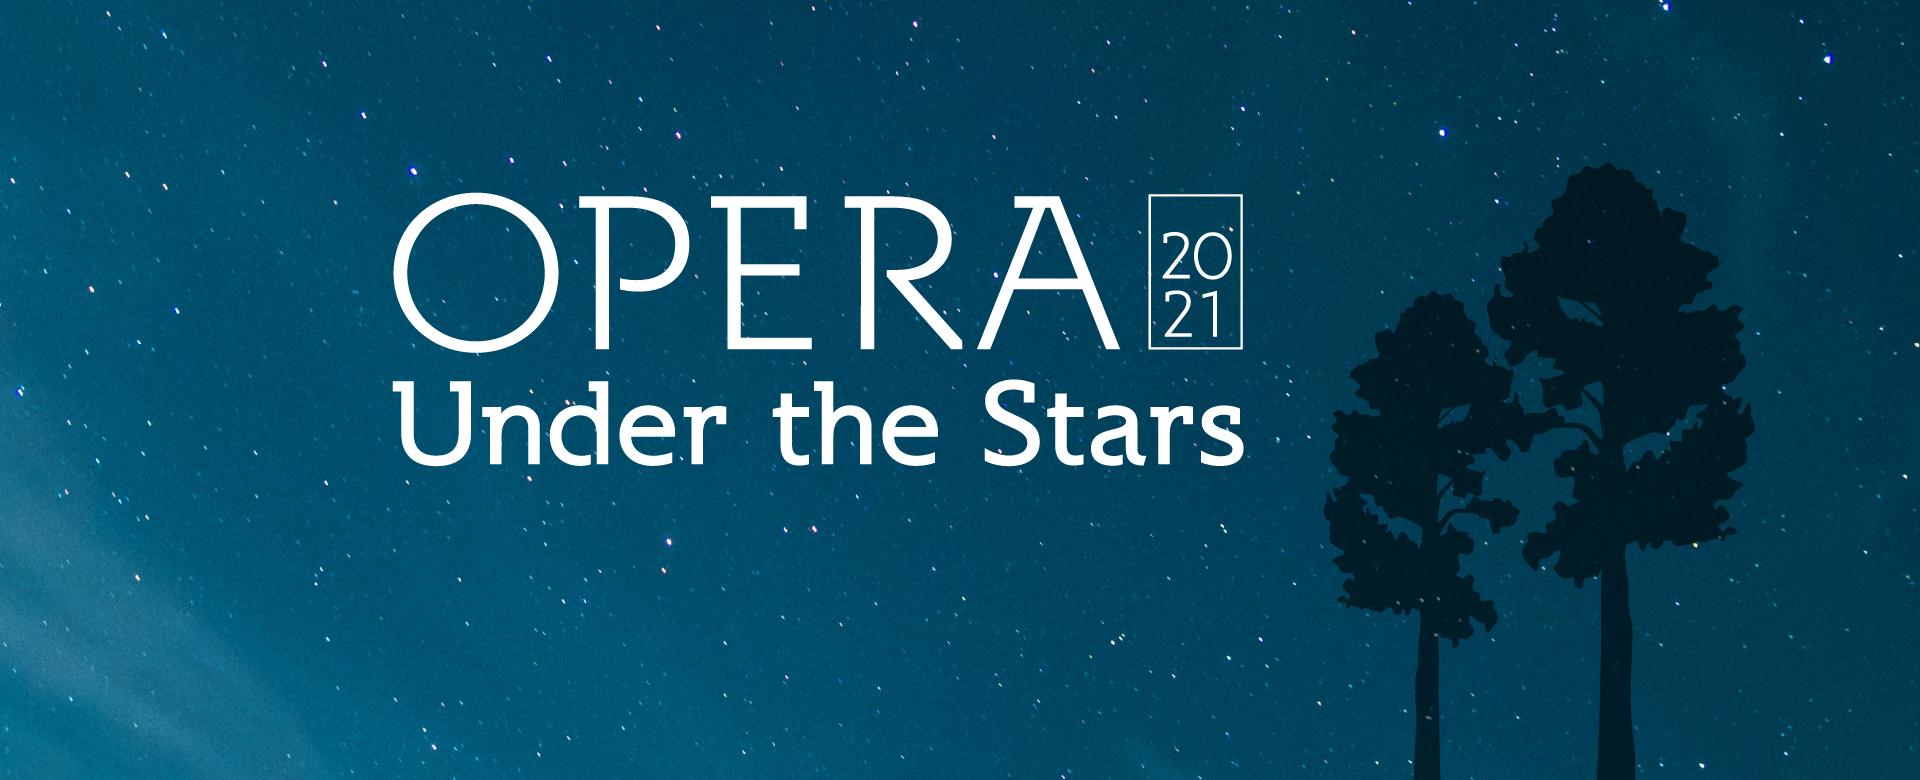 Opera Under the Stars banner